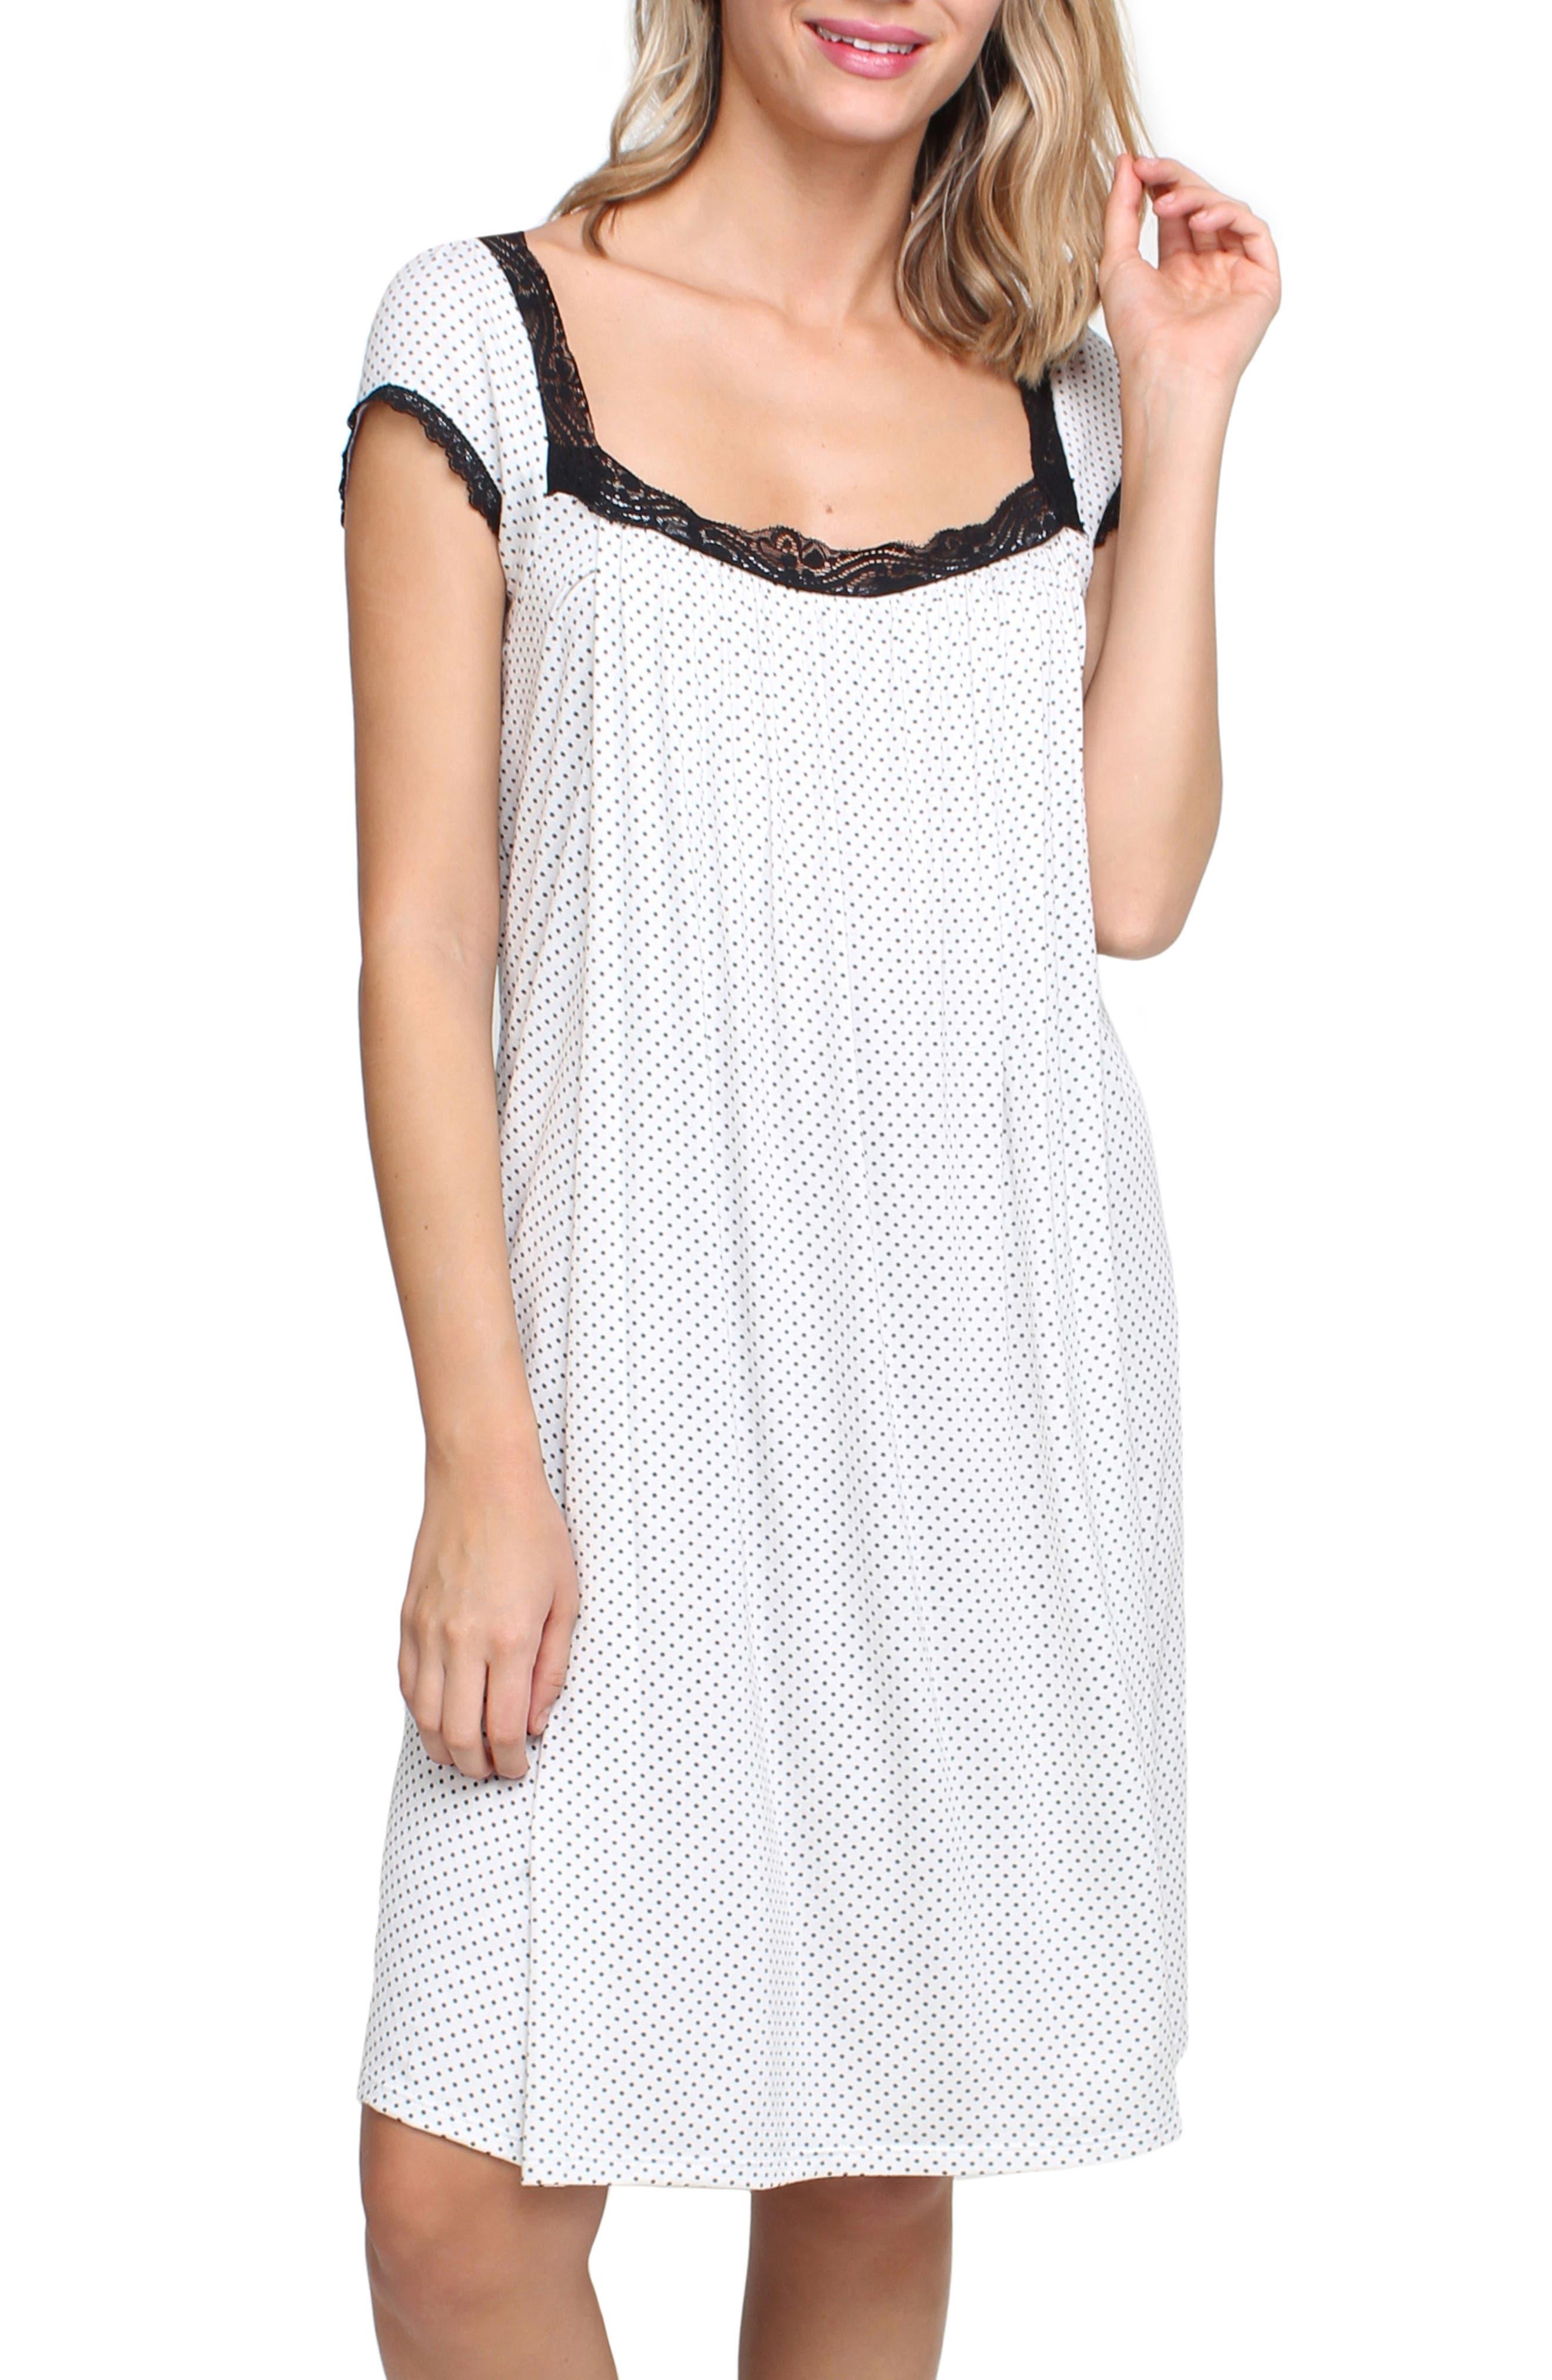 Savi Mom Joliet Maternity/nursing Nightgown, Black